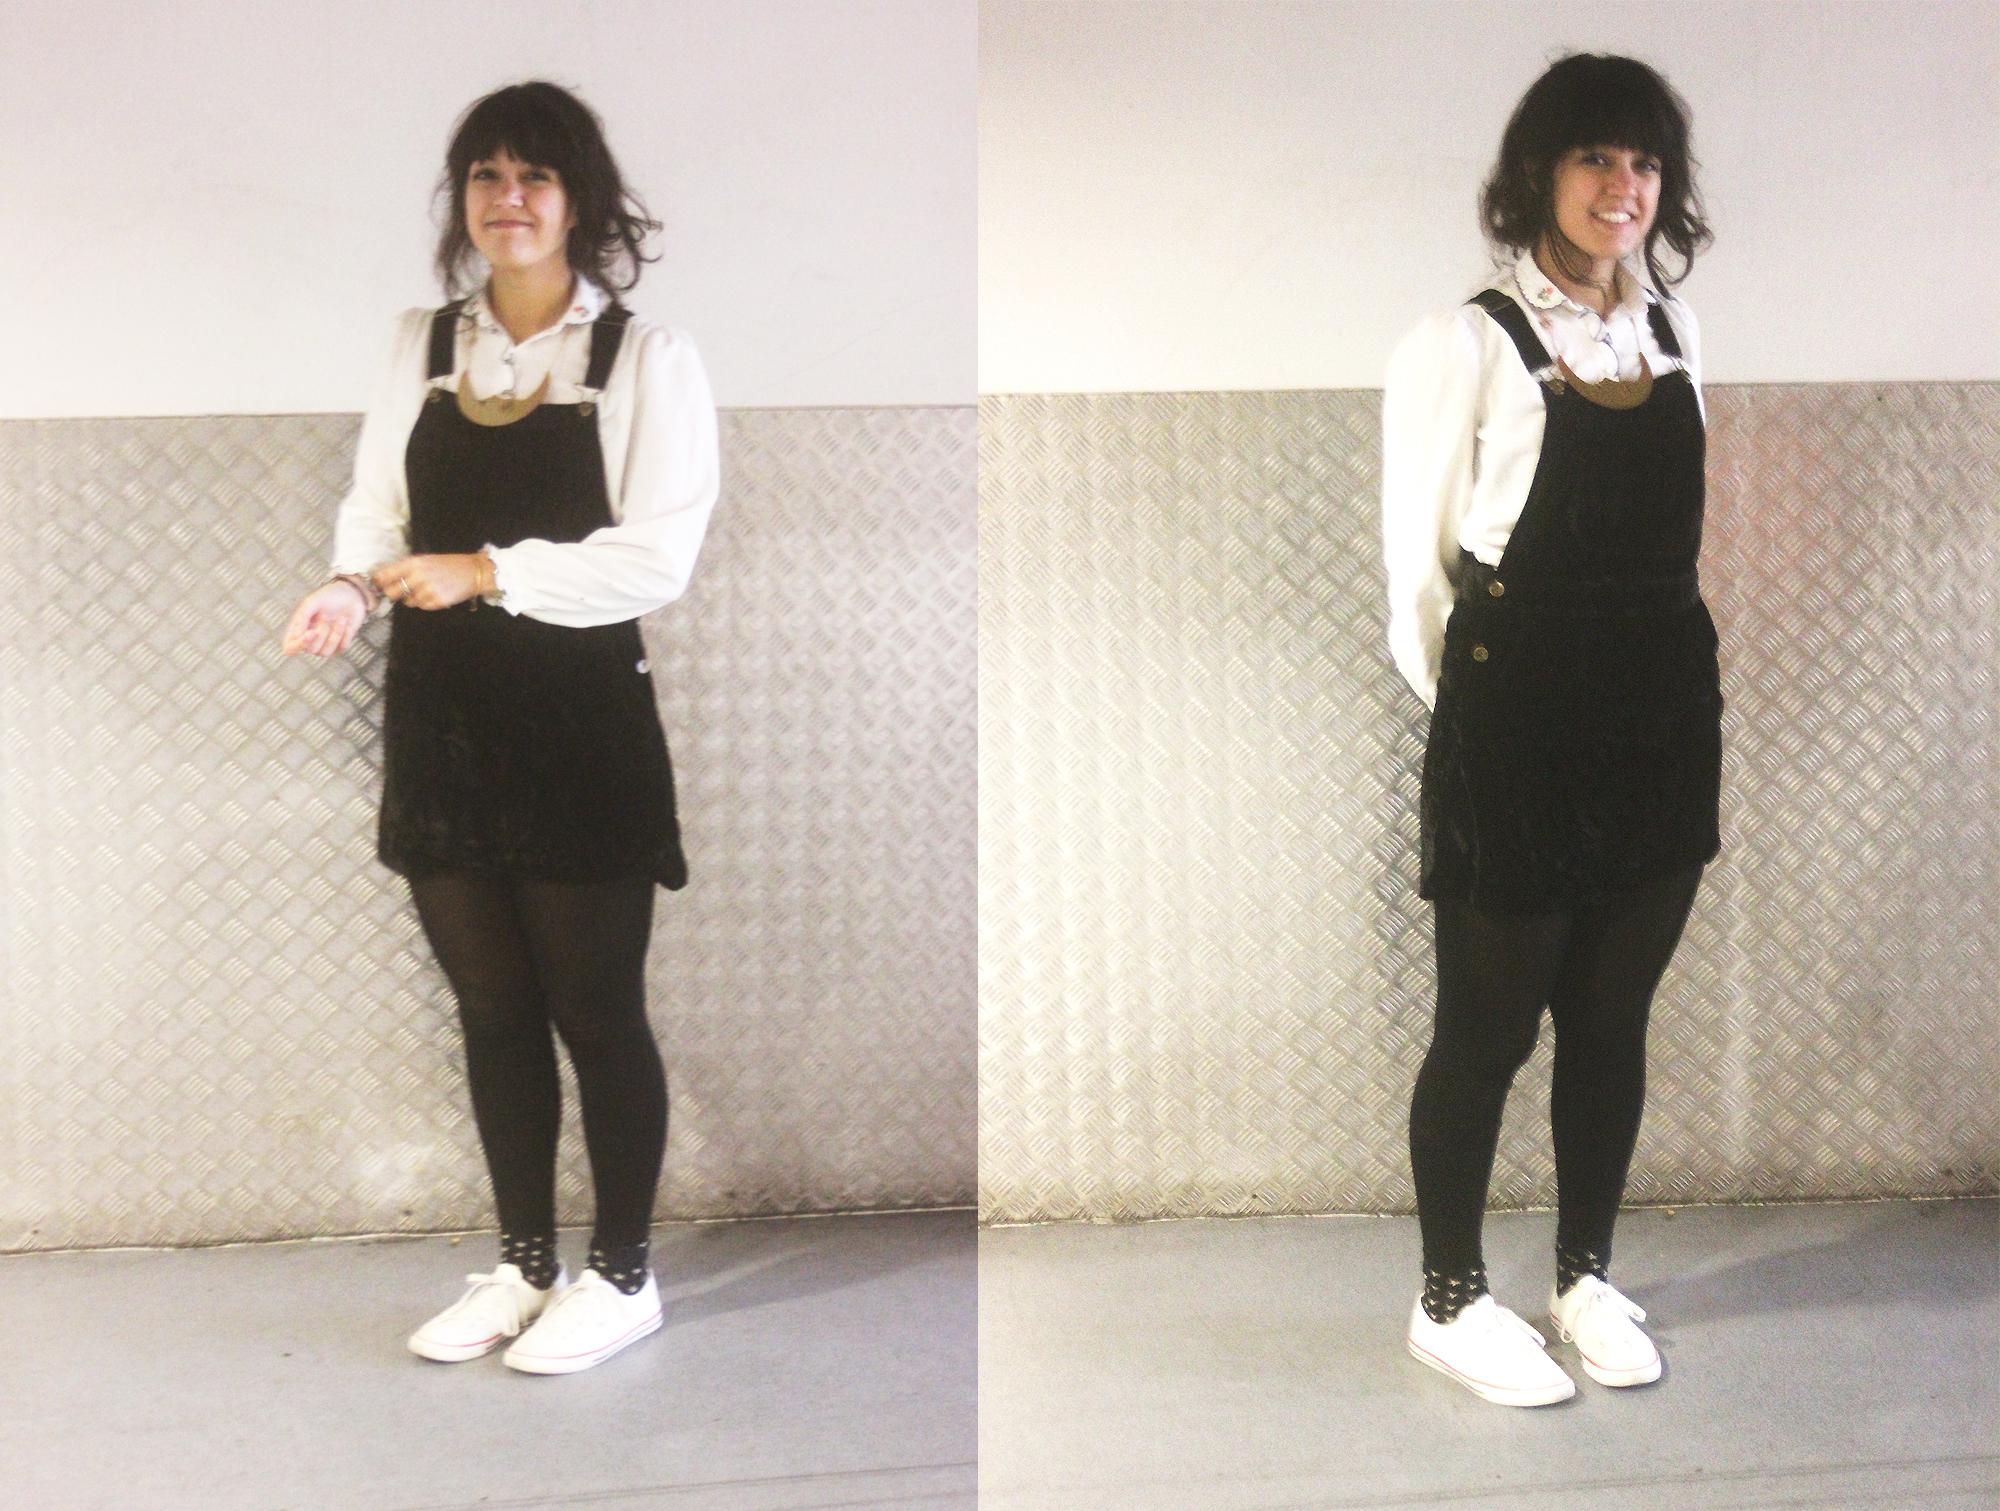 black velvet dress dungaree pinafore floral blouse vintage smiley smile happy girl tape parade laila